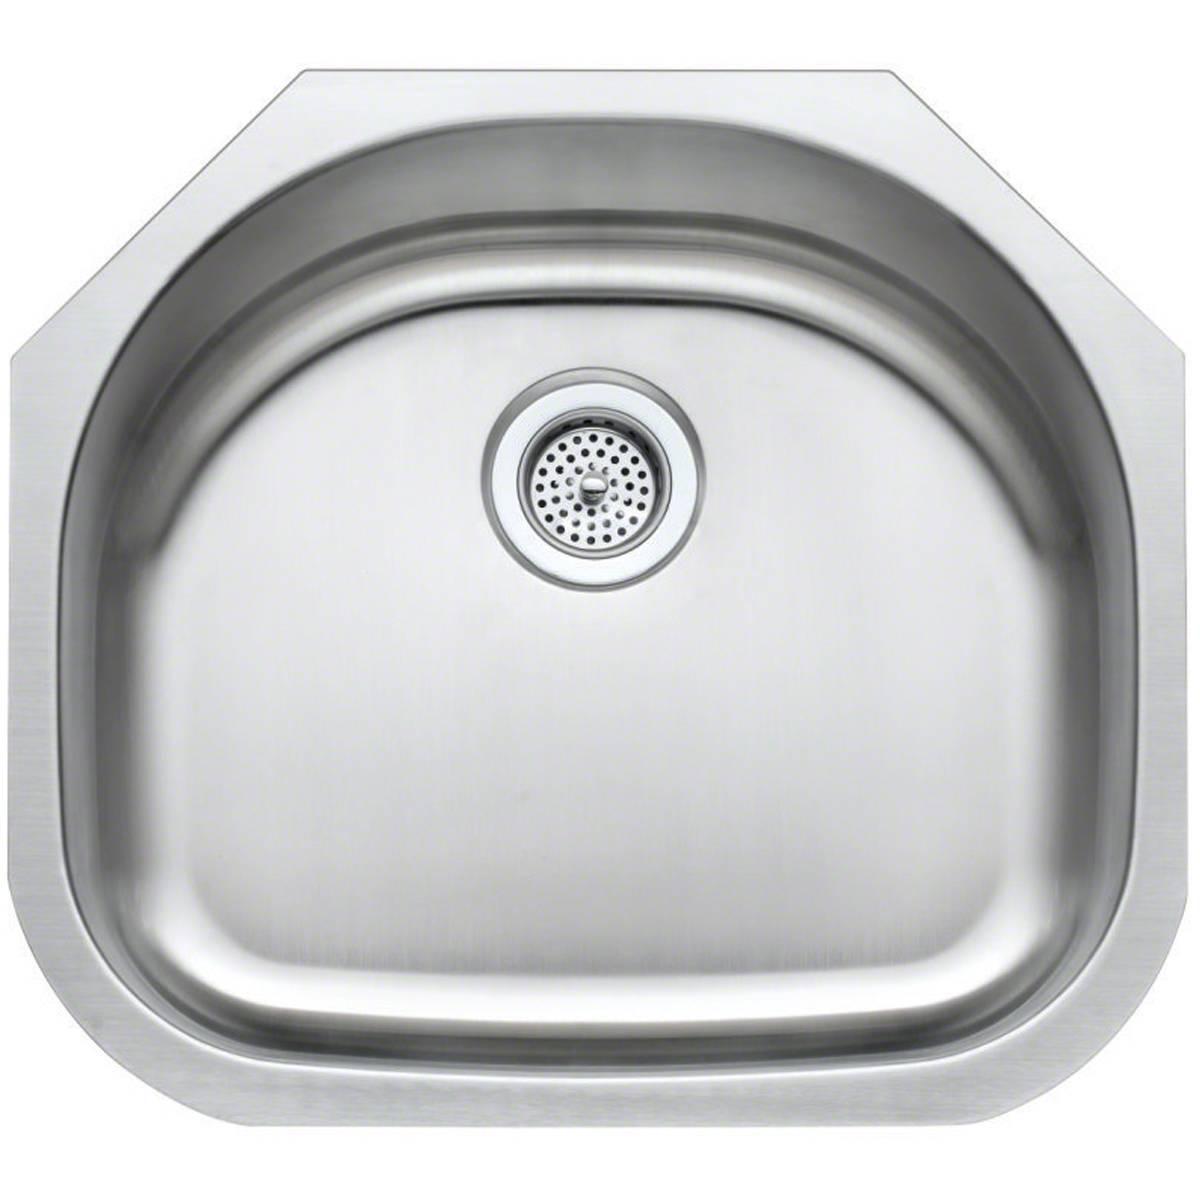 Sinks -ss-18-gau-single-bowl-2321-SIN-18-SINBWL-2321